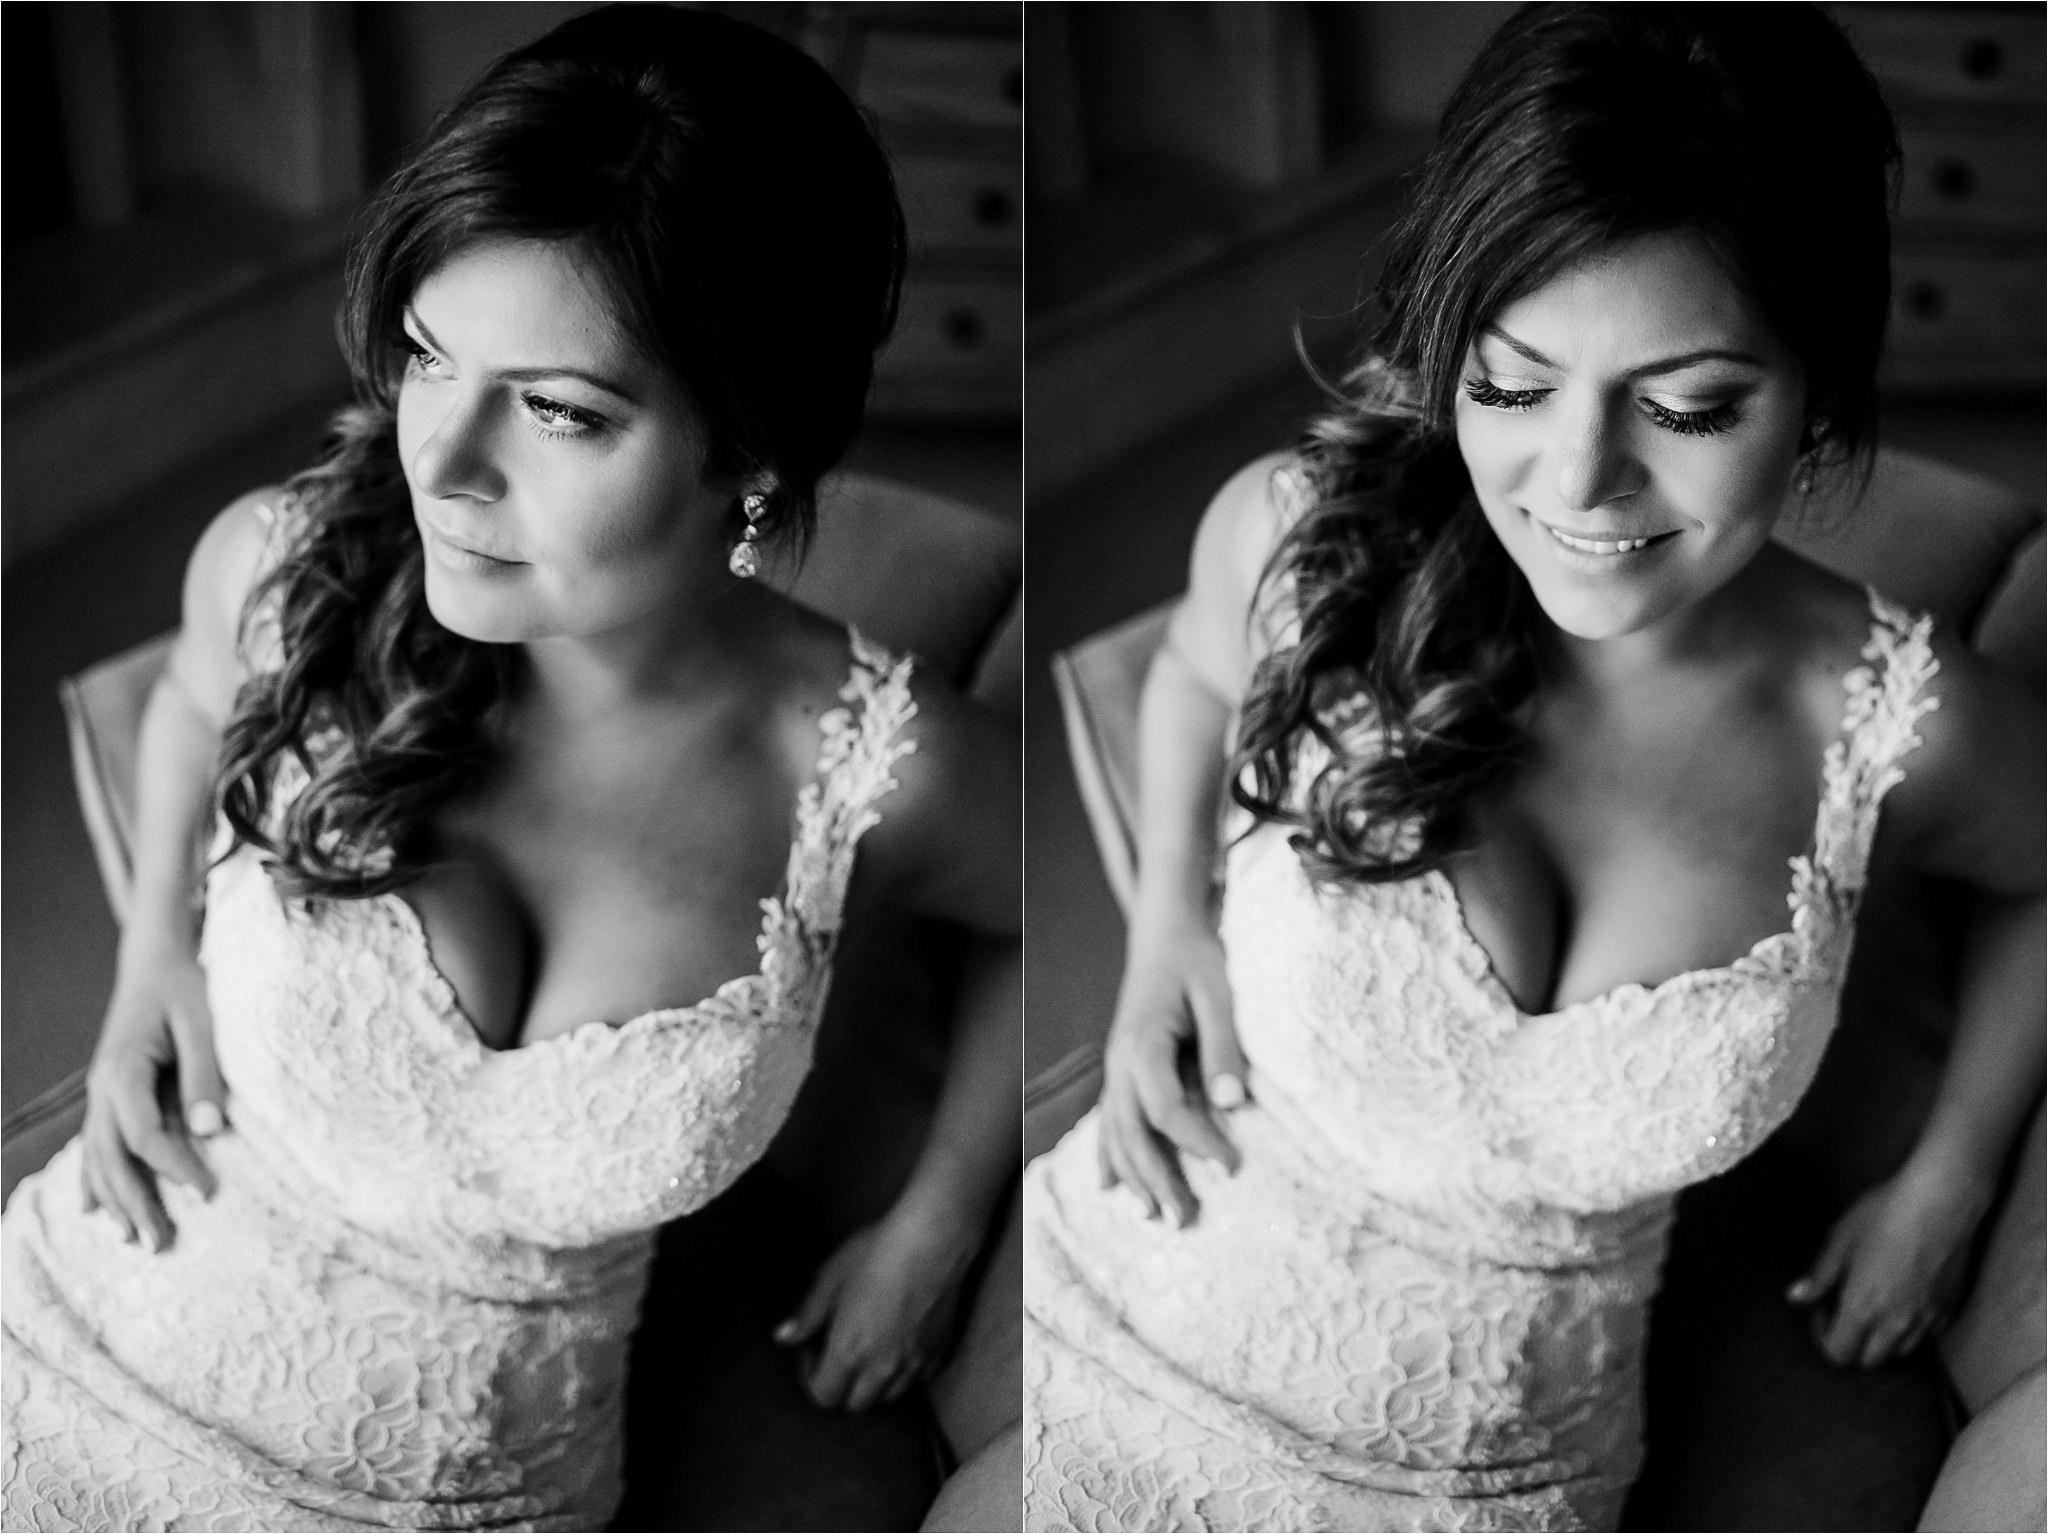 jessica-roman-photography-arden hills wedding photograpger-sacramento-boise-5.jpg